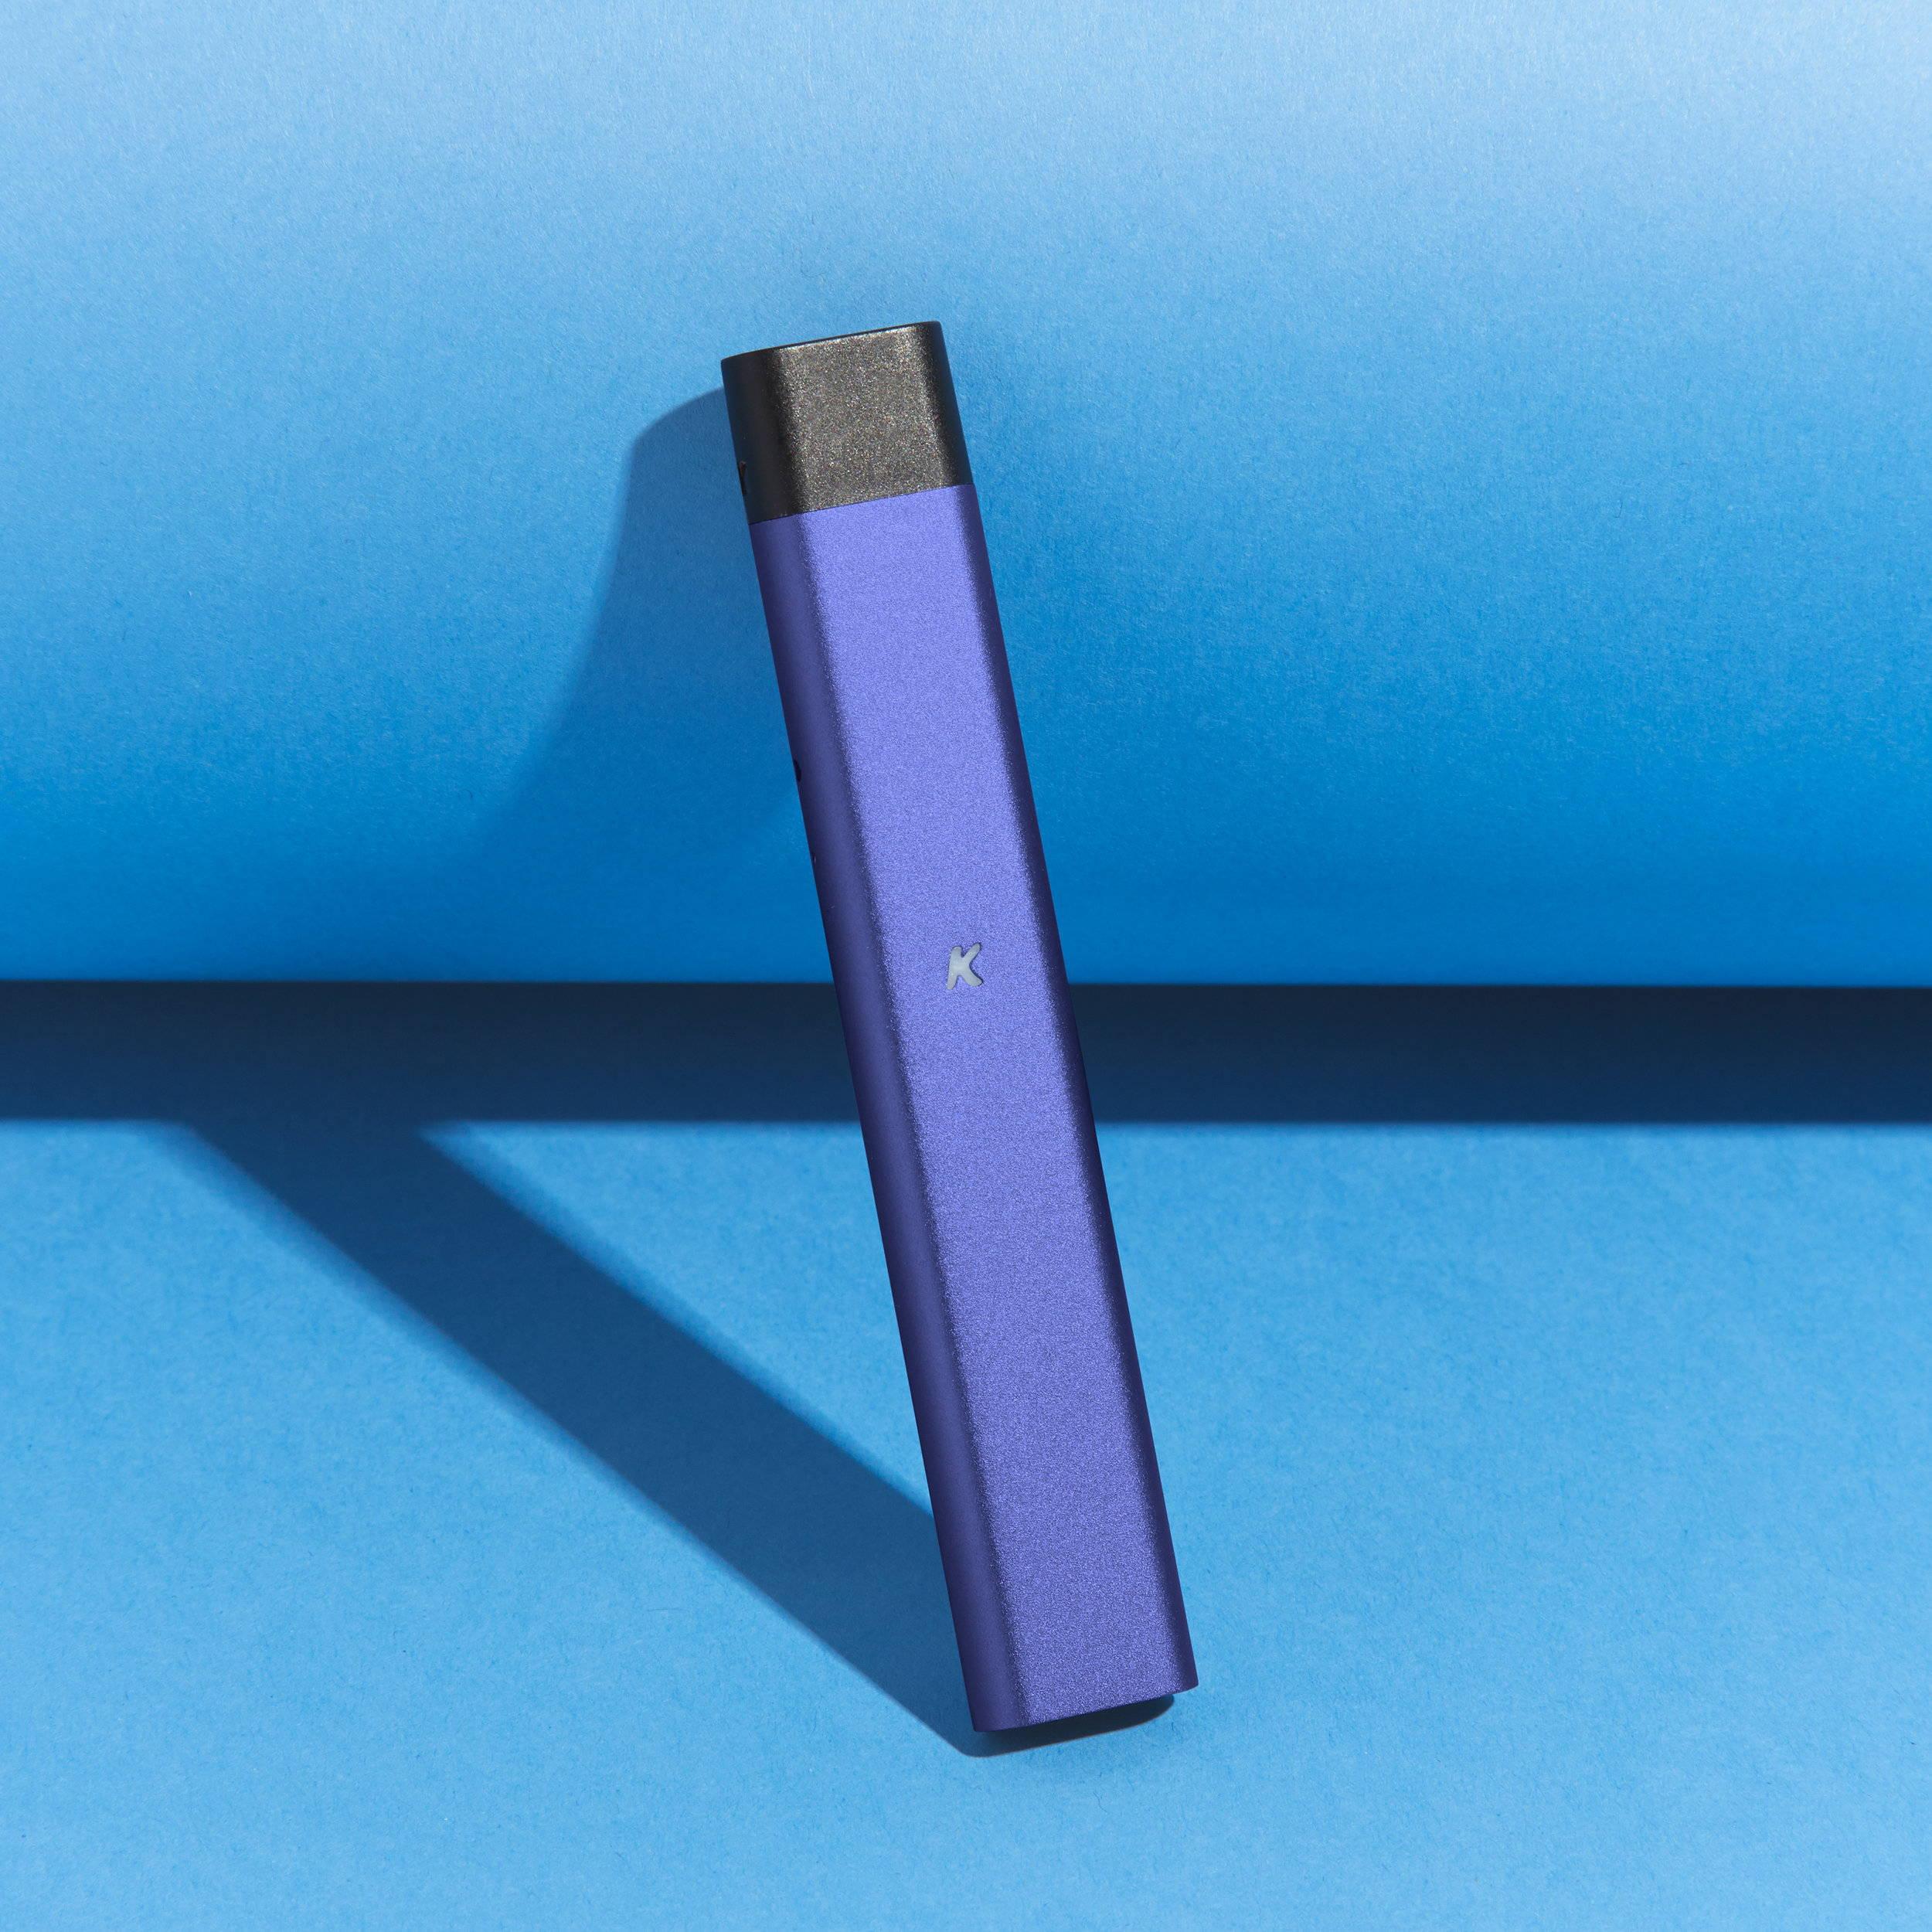 KandyPens portable vaporizer purple